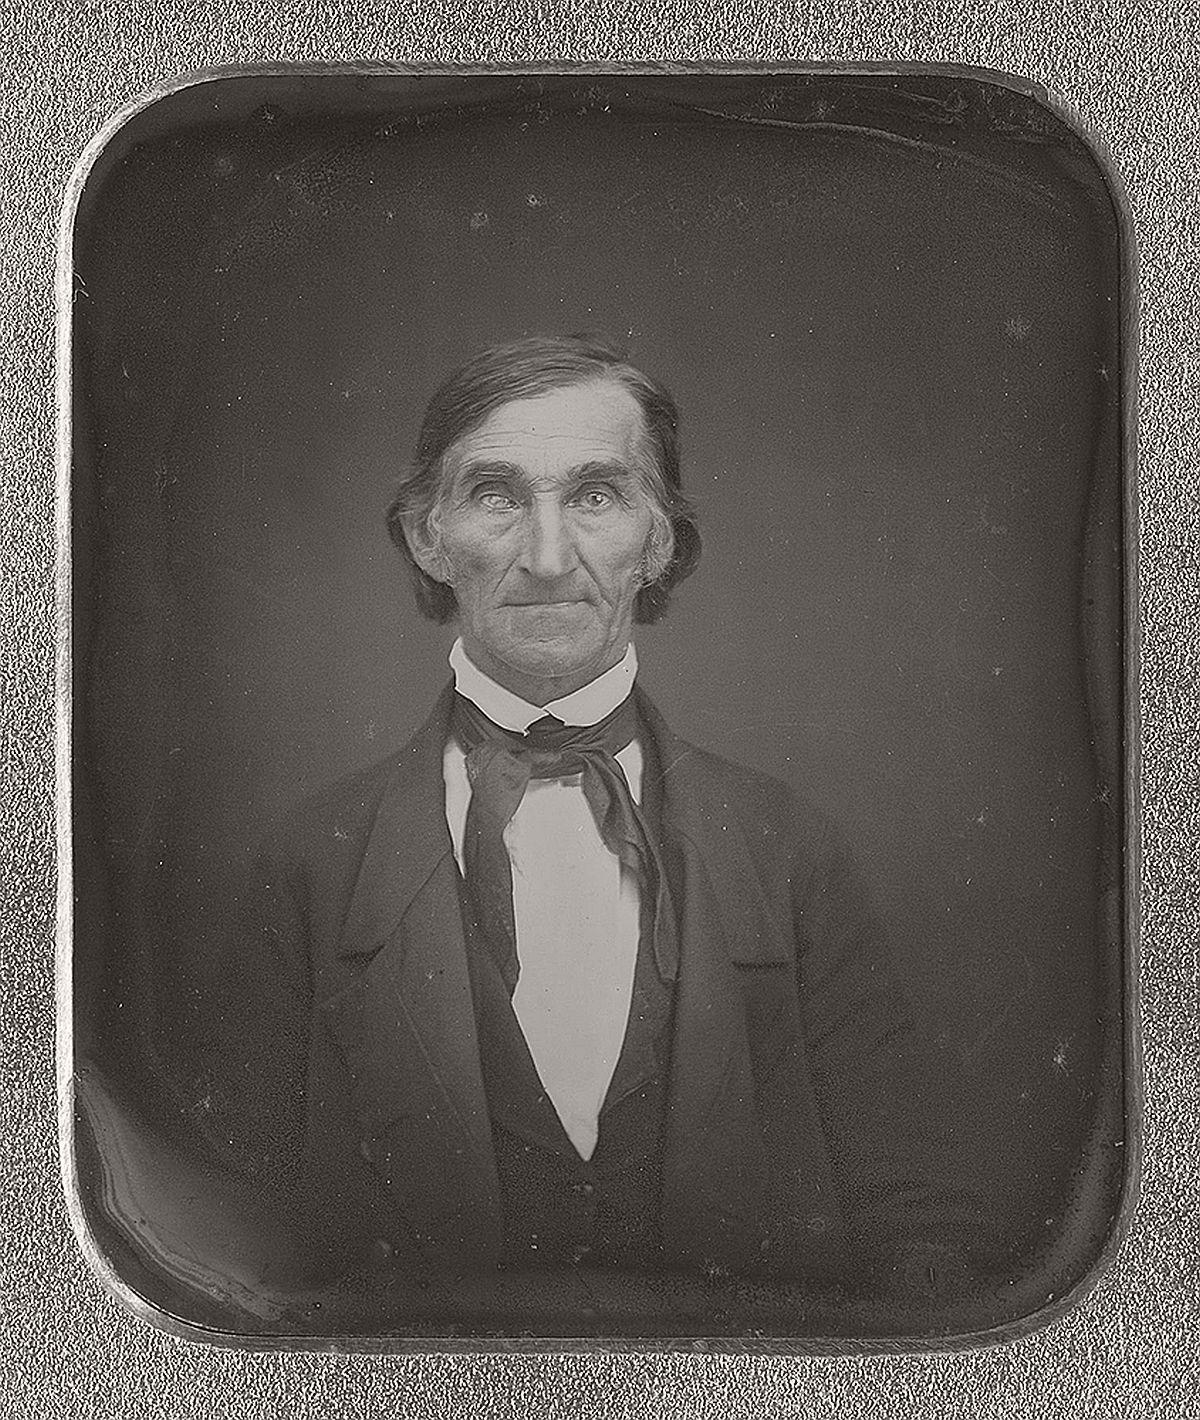 daguerreotype-portrait-people-born-in-the-late-18th-xviii-century-1700s-vintage-35